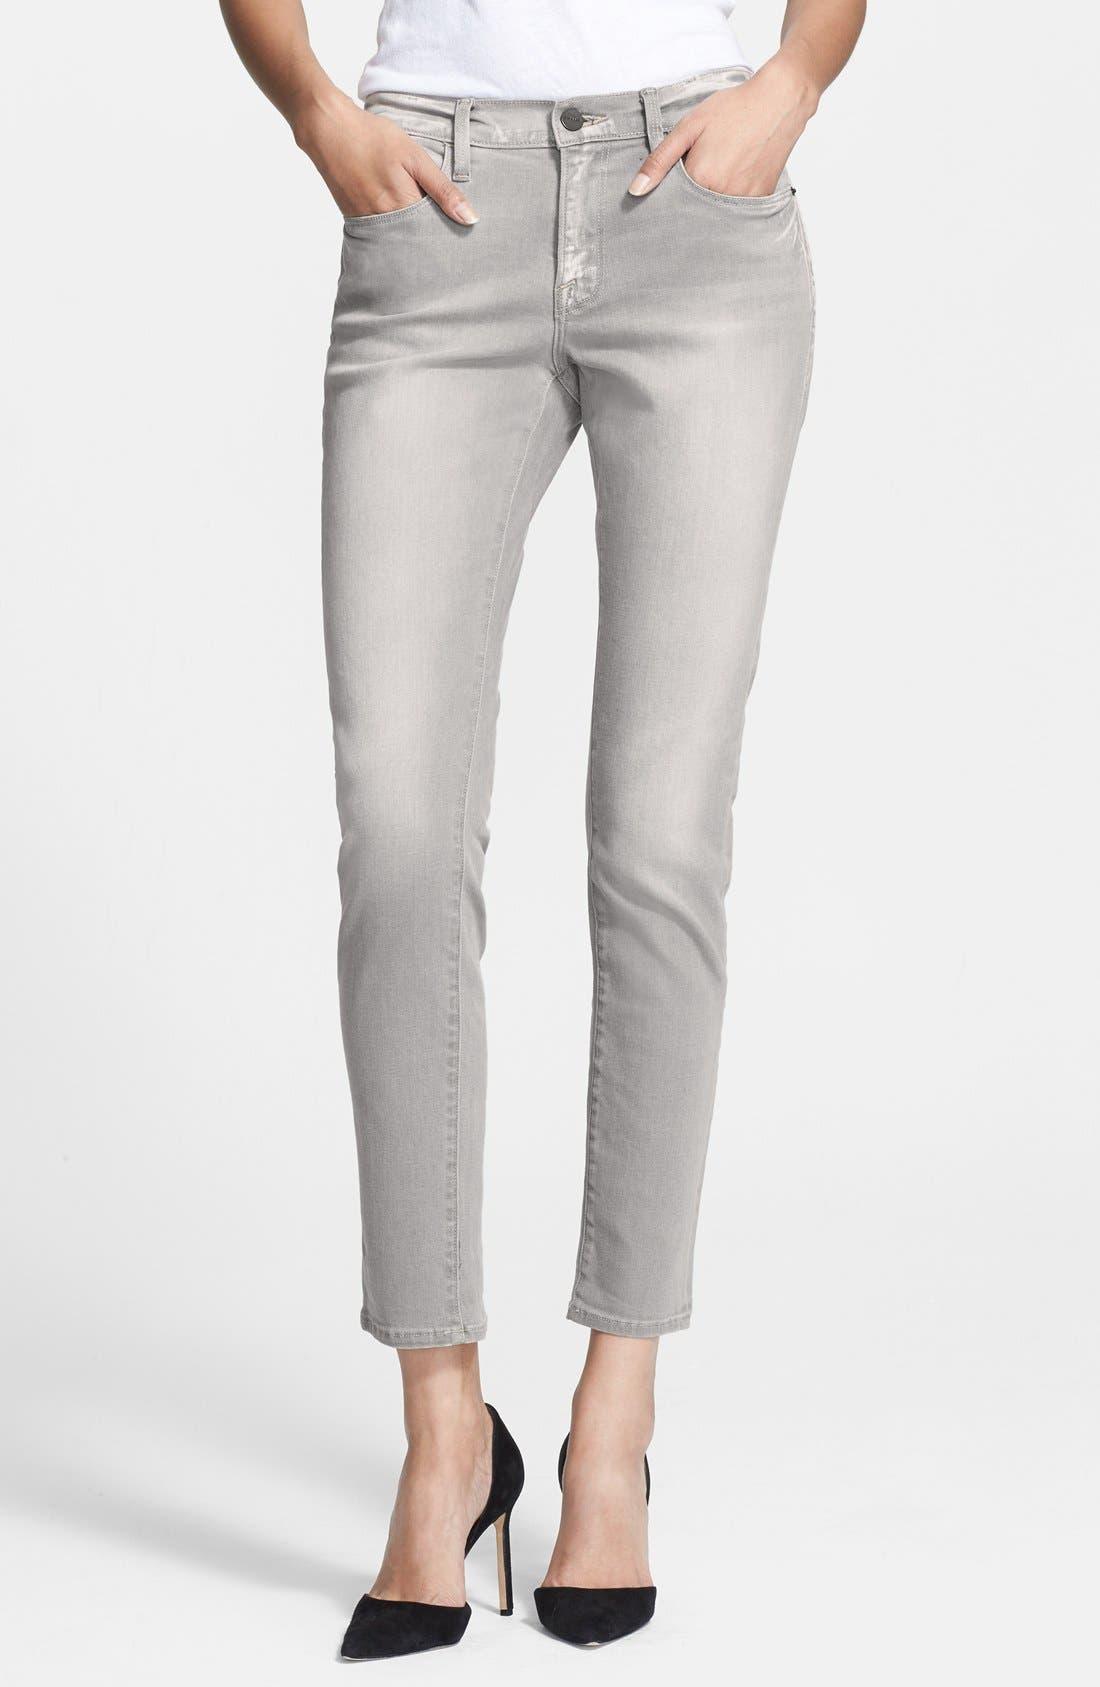 Alternate Image 1 Selected - Frame Denim 'Le Garcon' Slim Boyfriend Jeans (Kensington)